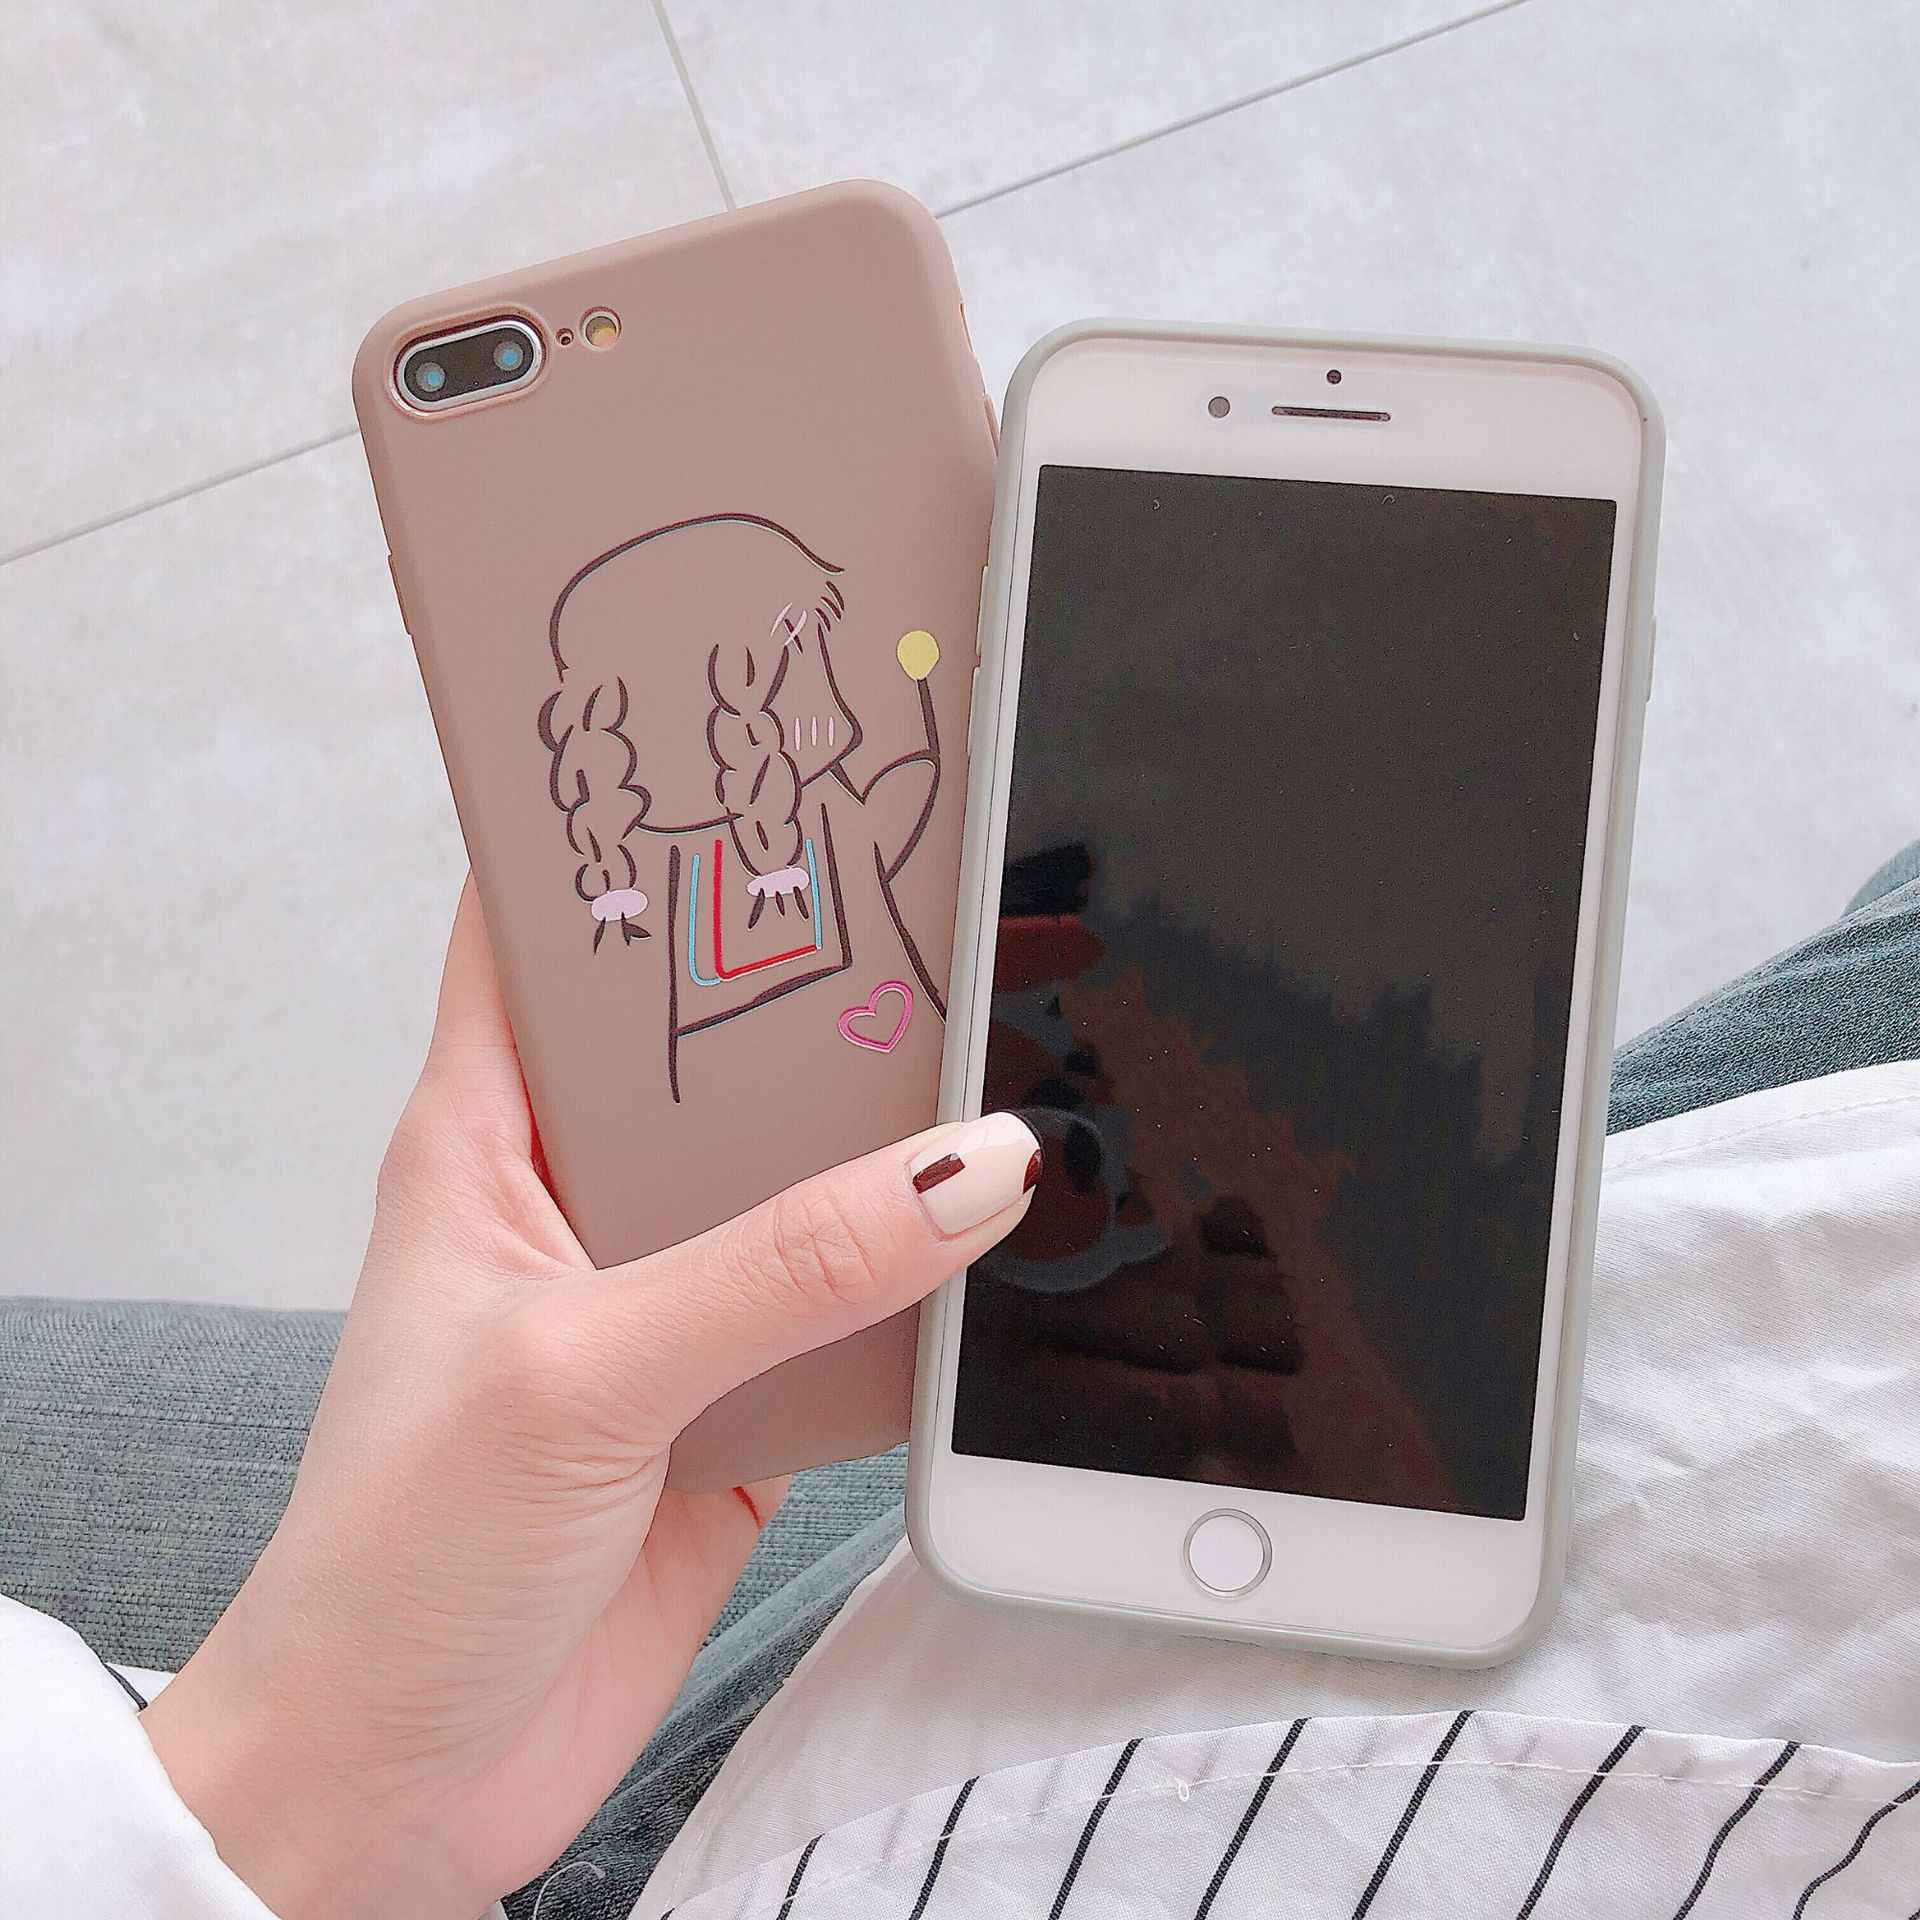 حافظة هاتف من البولي يوريثان لهاتف آيفون XR XS Max 7 8 6 6S Plus SE 2020 12 mini Heart غطاء شاي حليب كرتوني لهاتف آيفون 11 Pro Shell Fundas